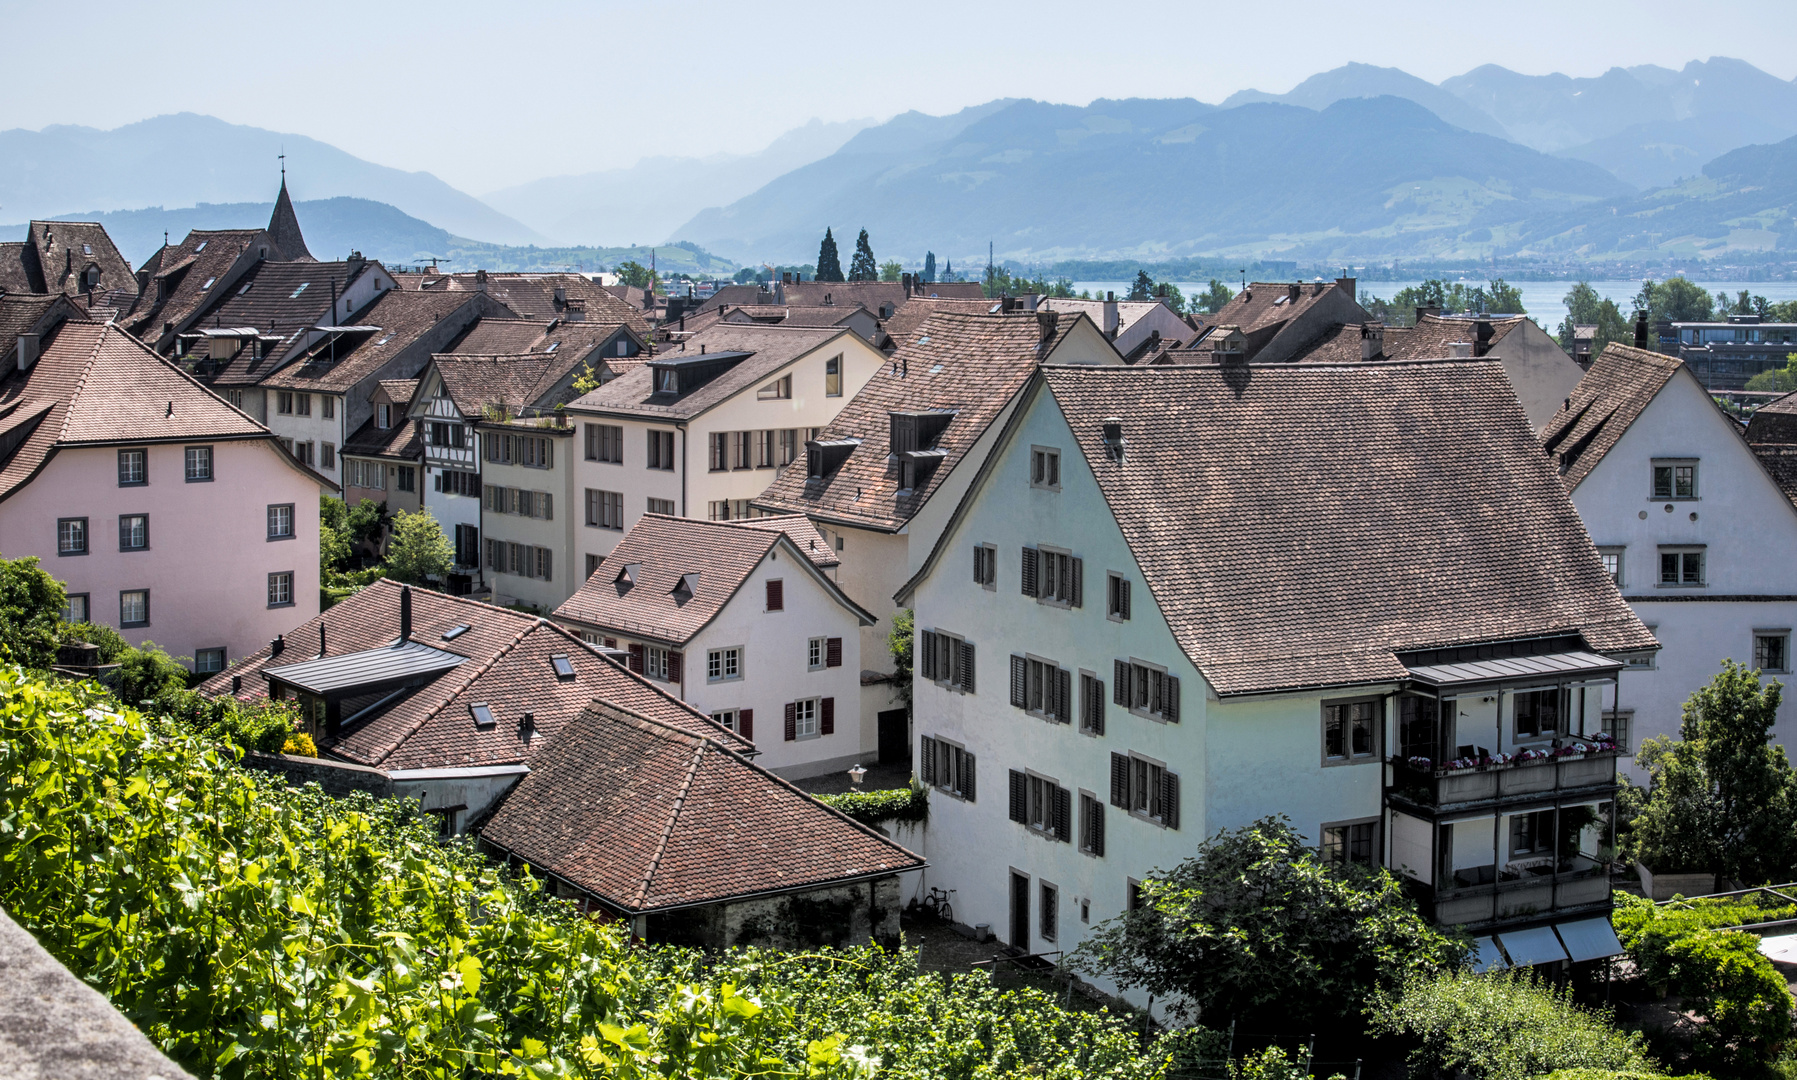 Ausblick vom Schlosshügel Rapperwil